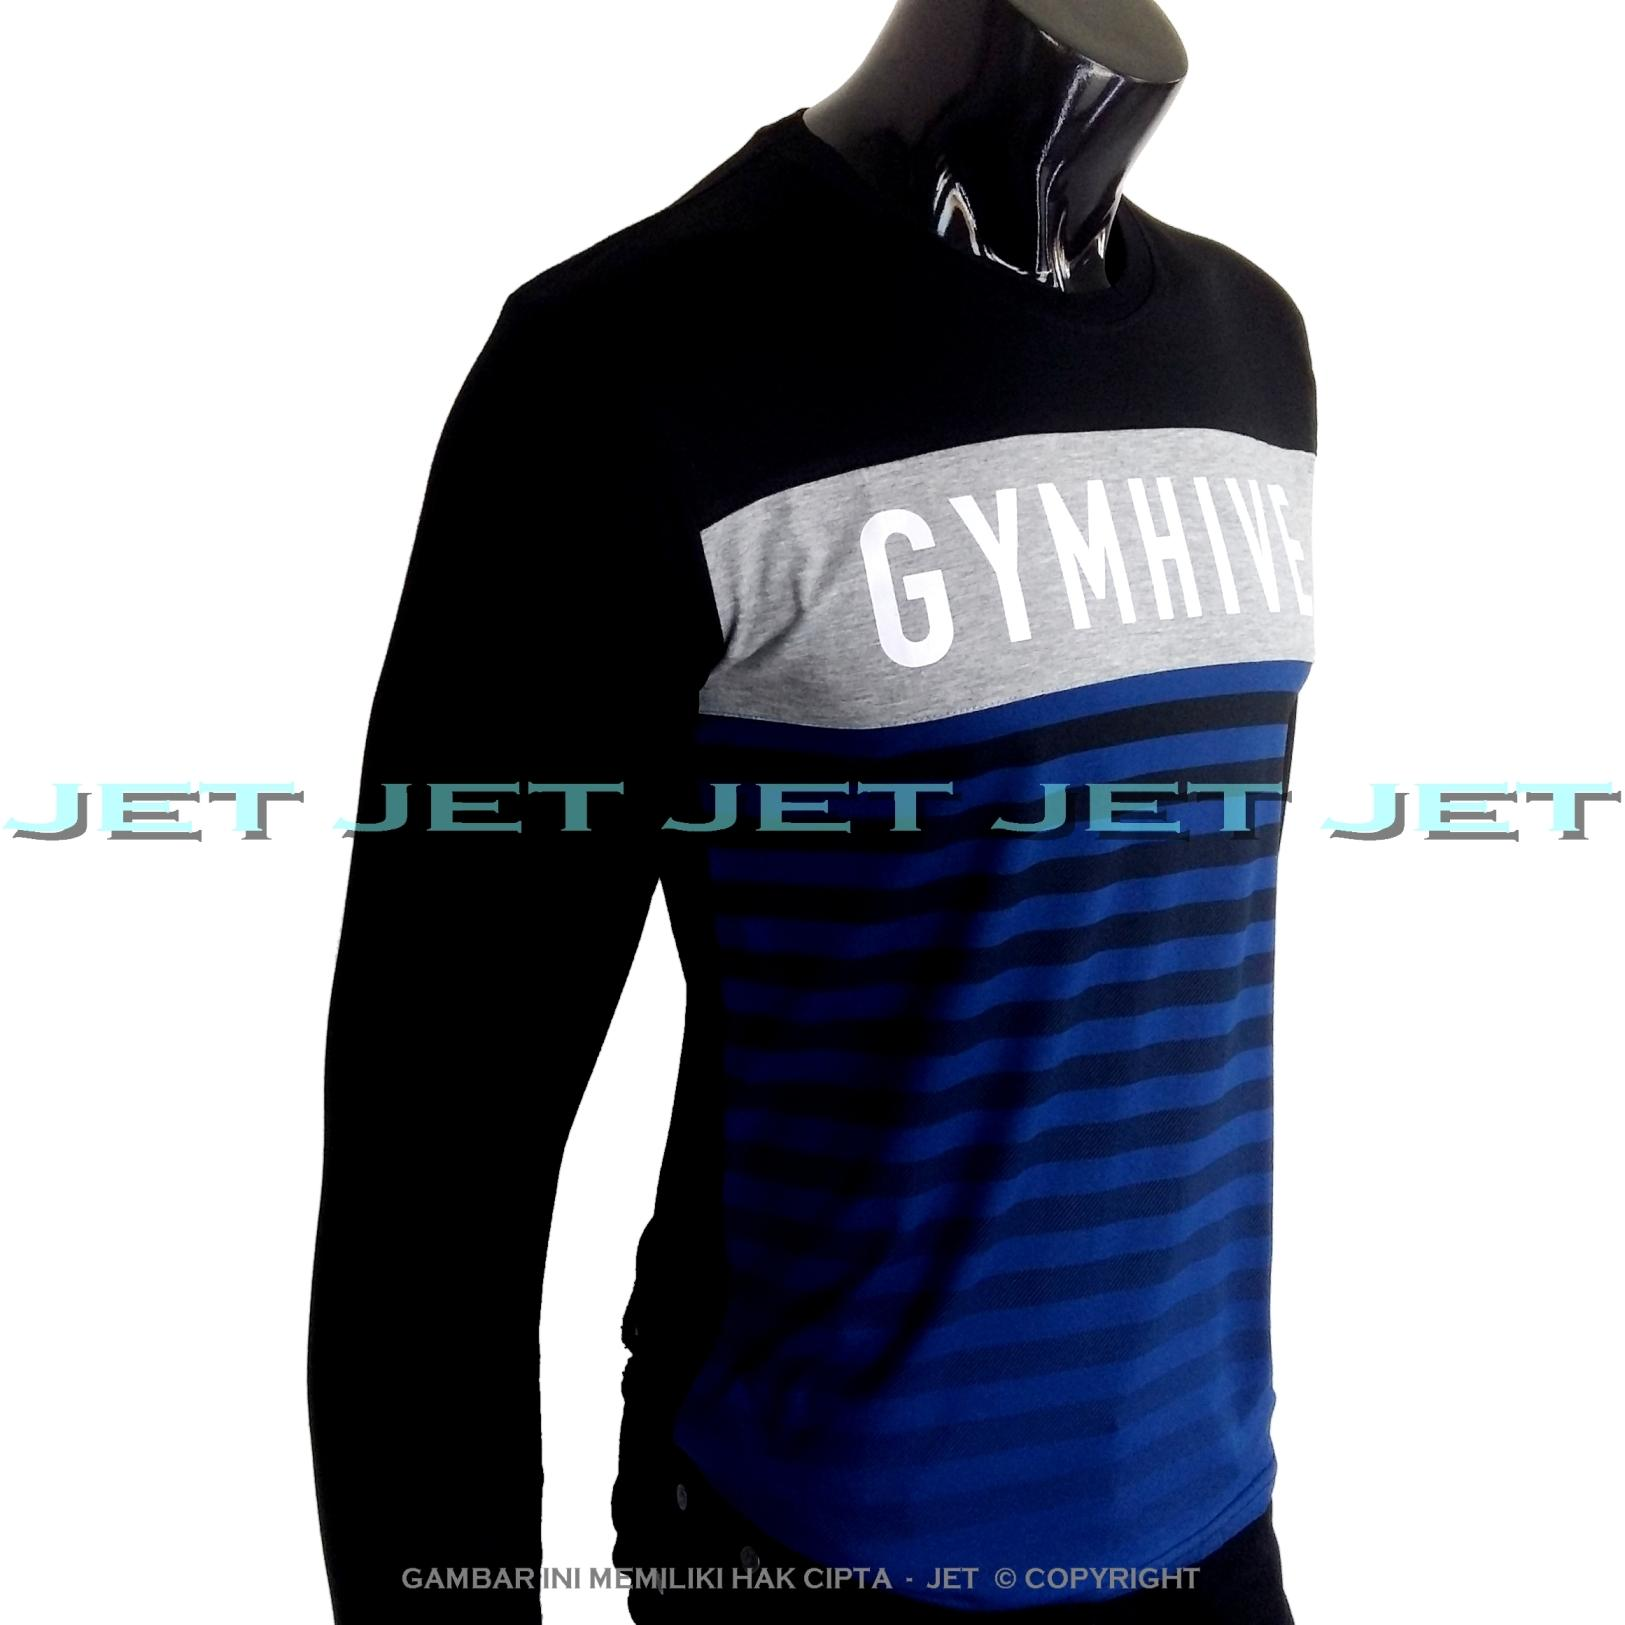 JET - Kaos Distro GYMHIVE Lengan Panjang Soft Rayon Viscose Blended Lycra Size M Fit To L Pria / Wanita Garis Salur Motif Visual Art